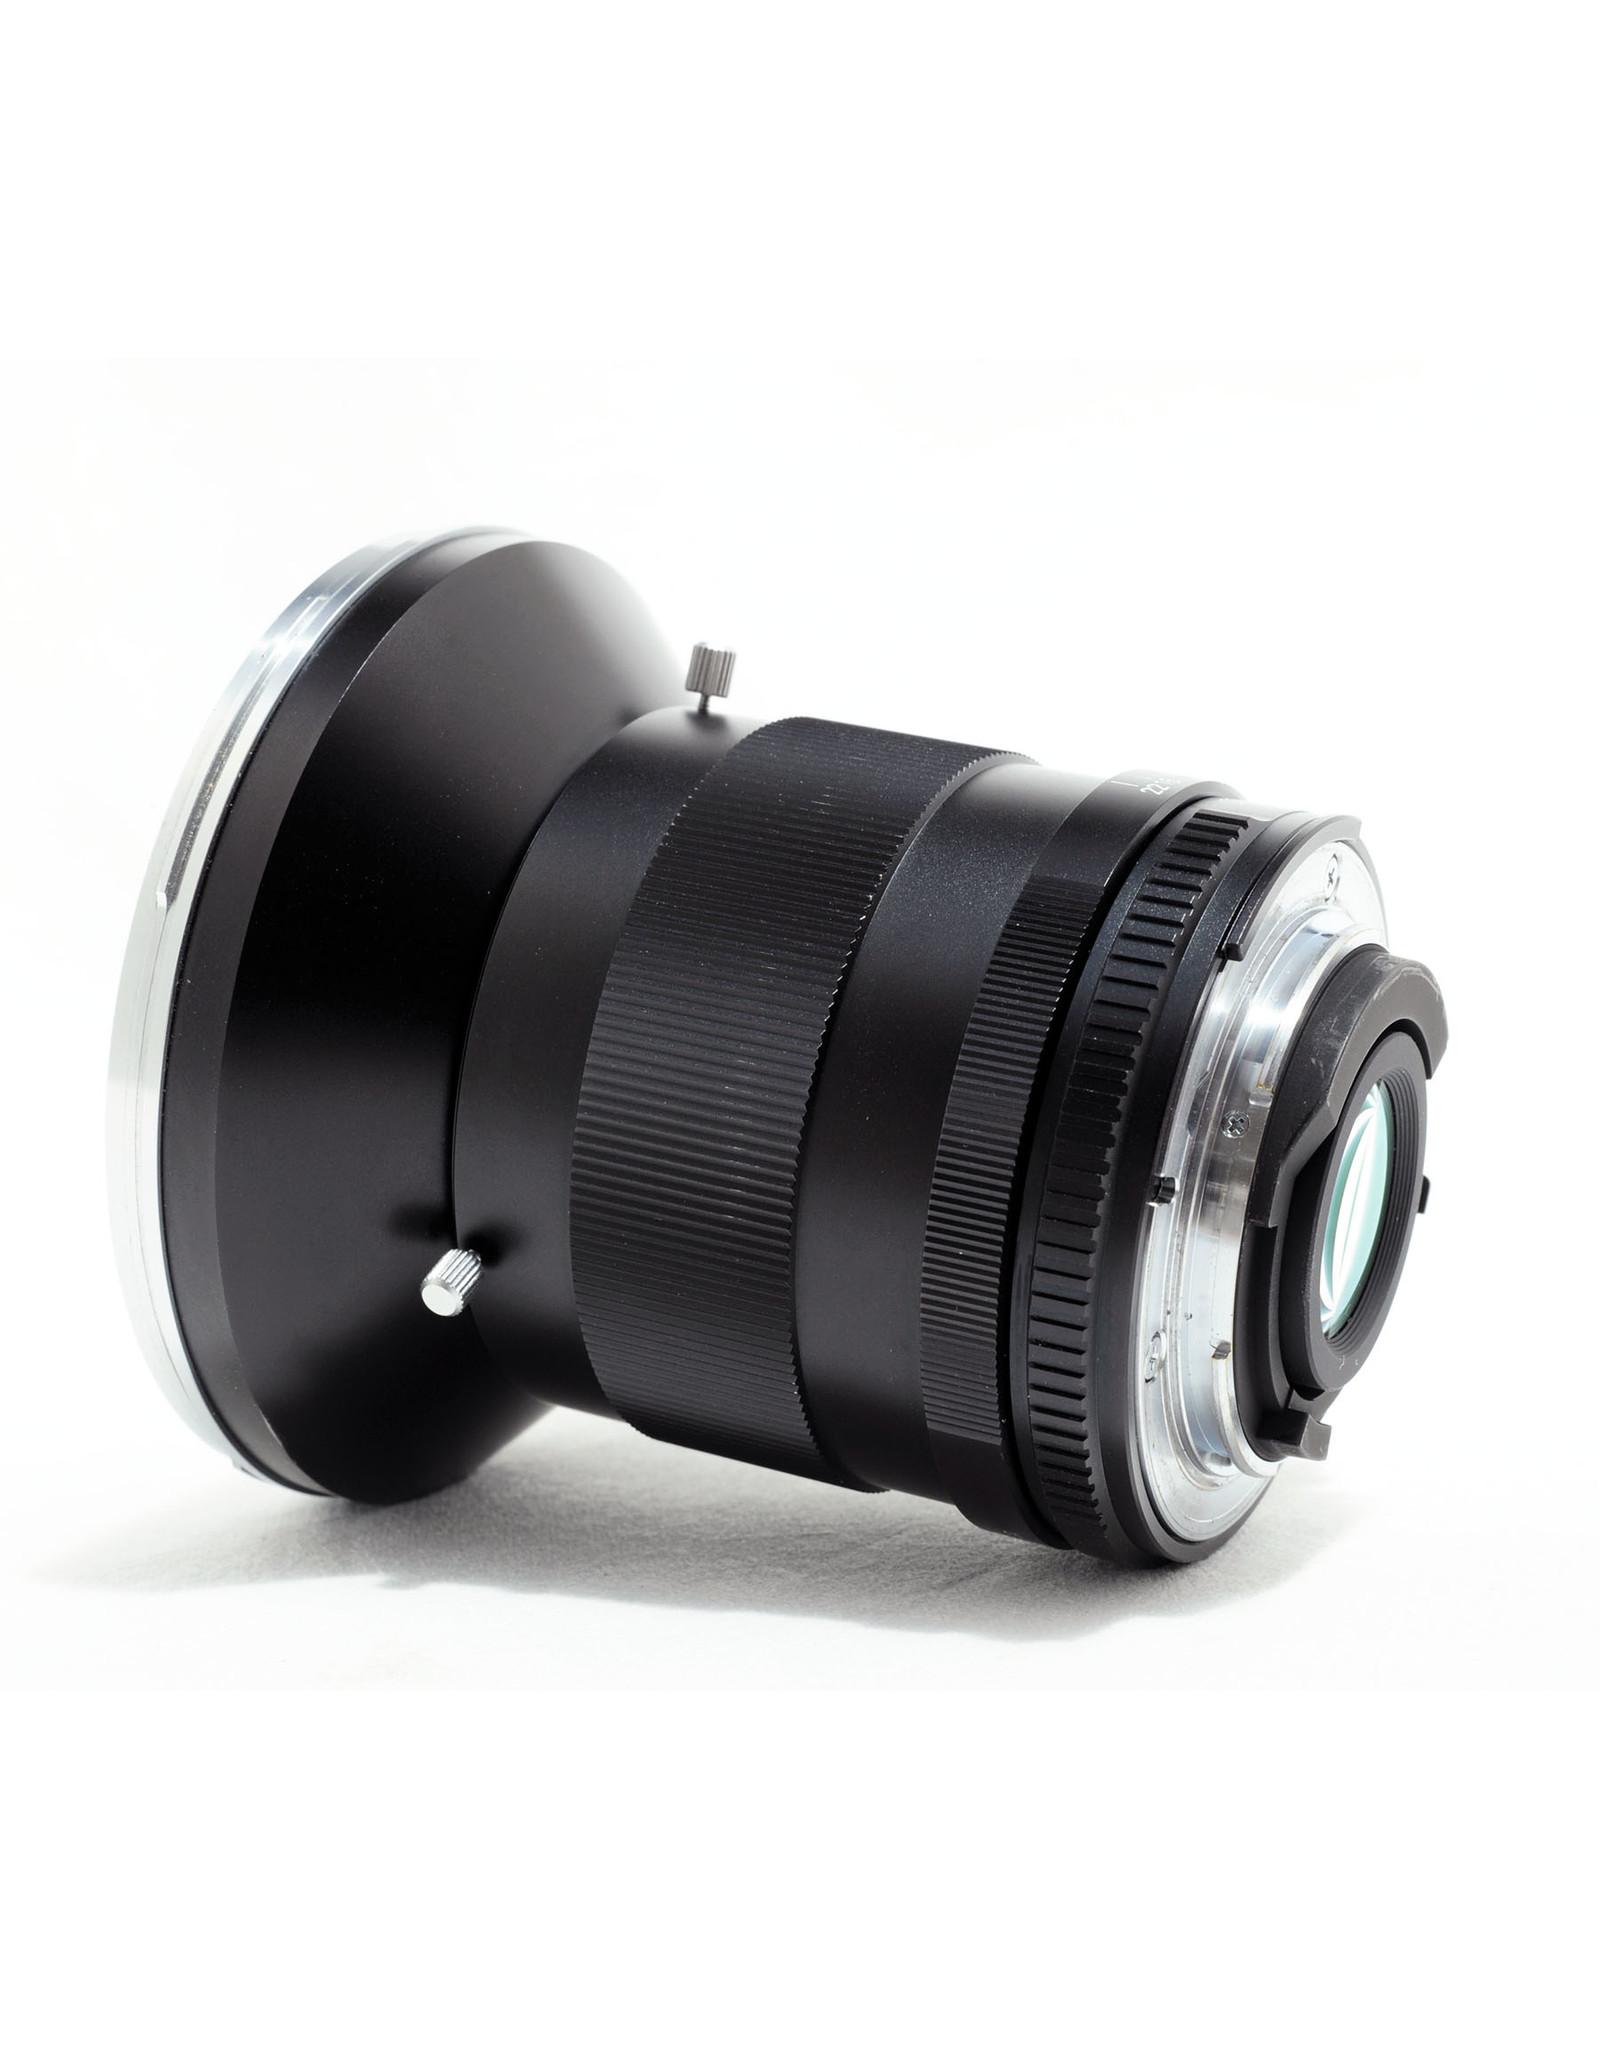 Zeiss Zeiss 21mm f2.8 Distagon ZF-I